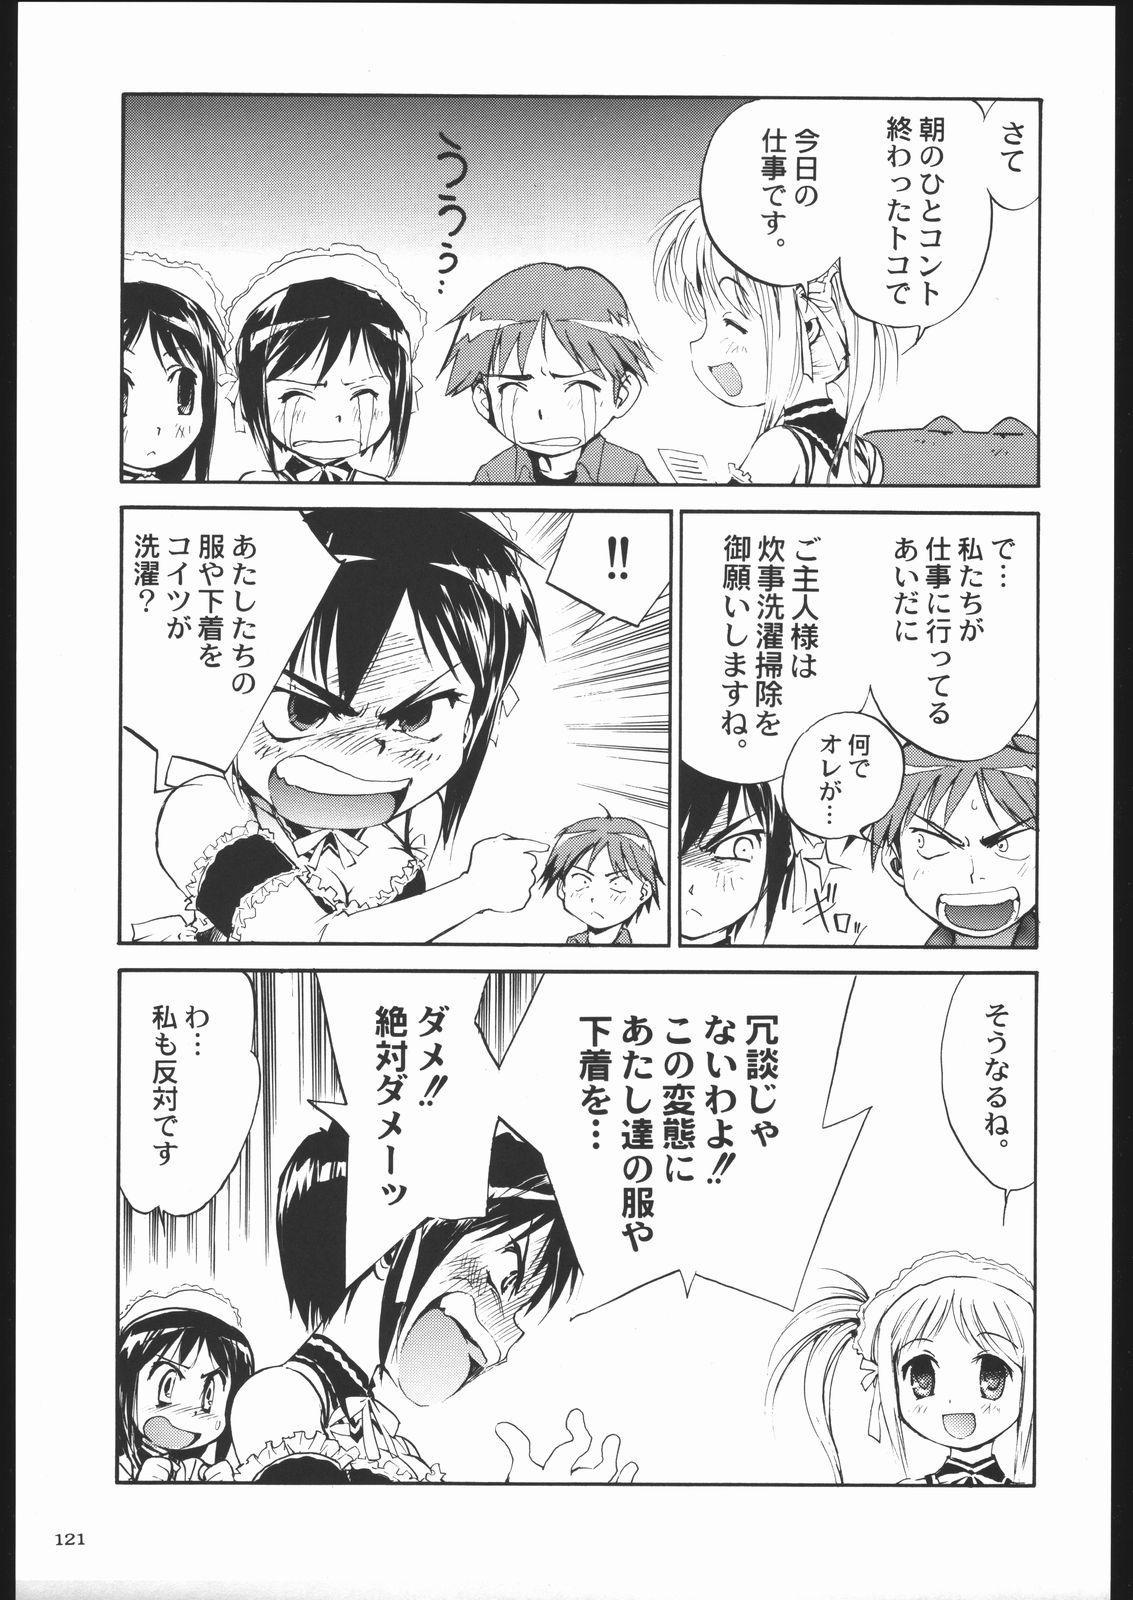 Adachi Misemono Club 119